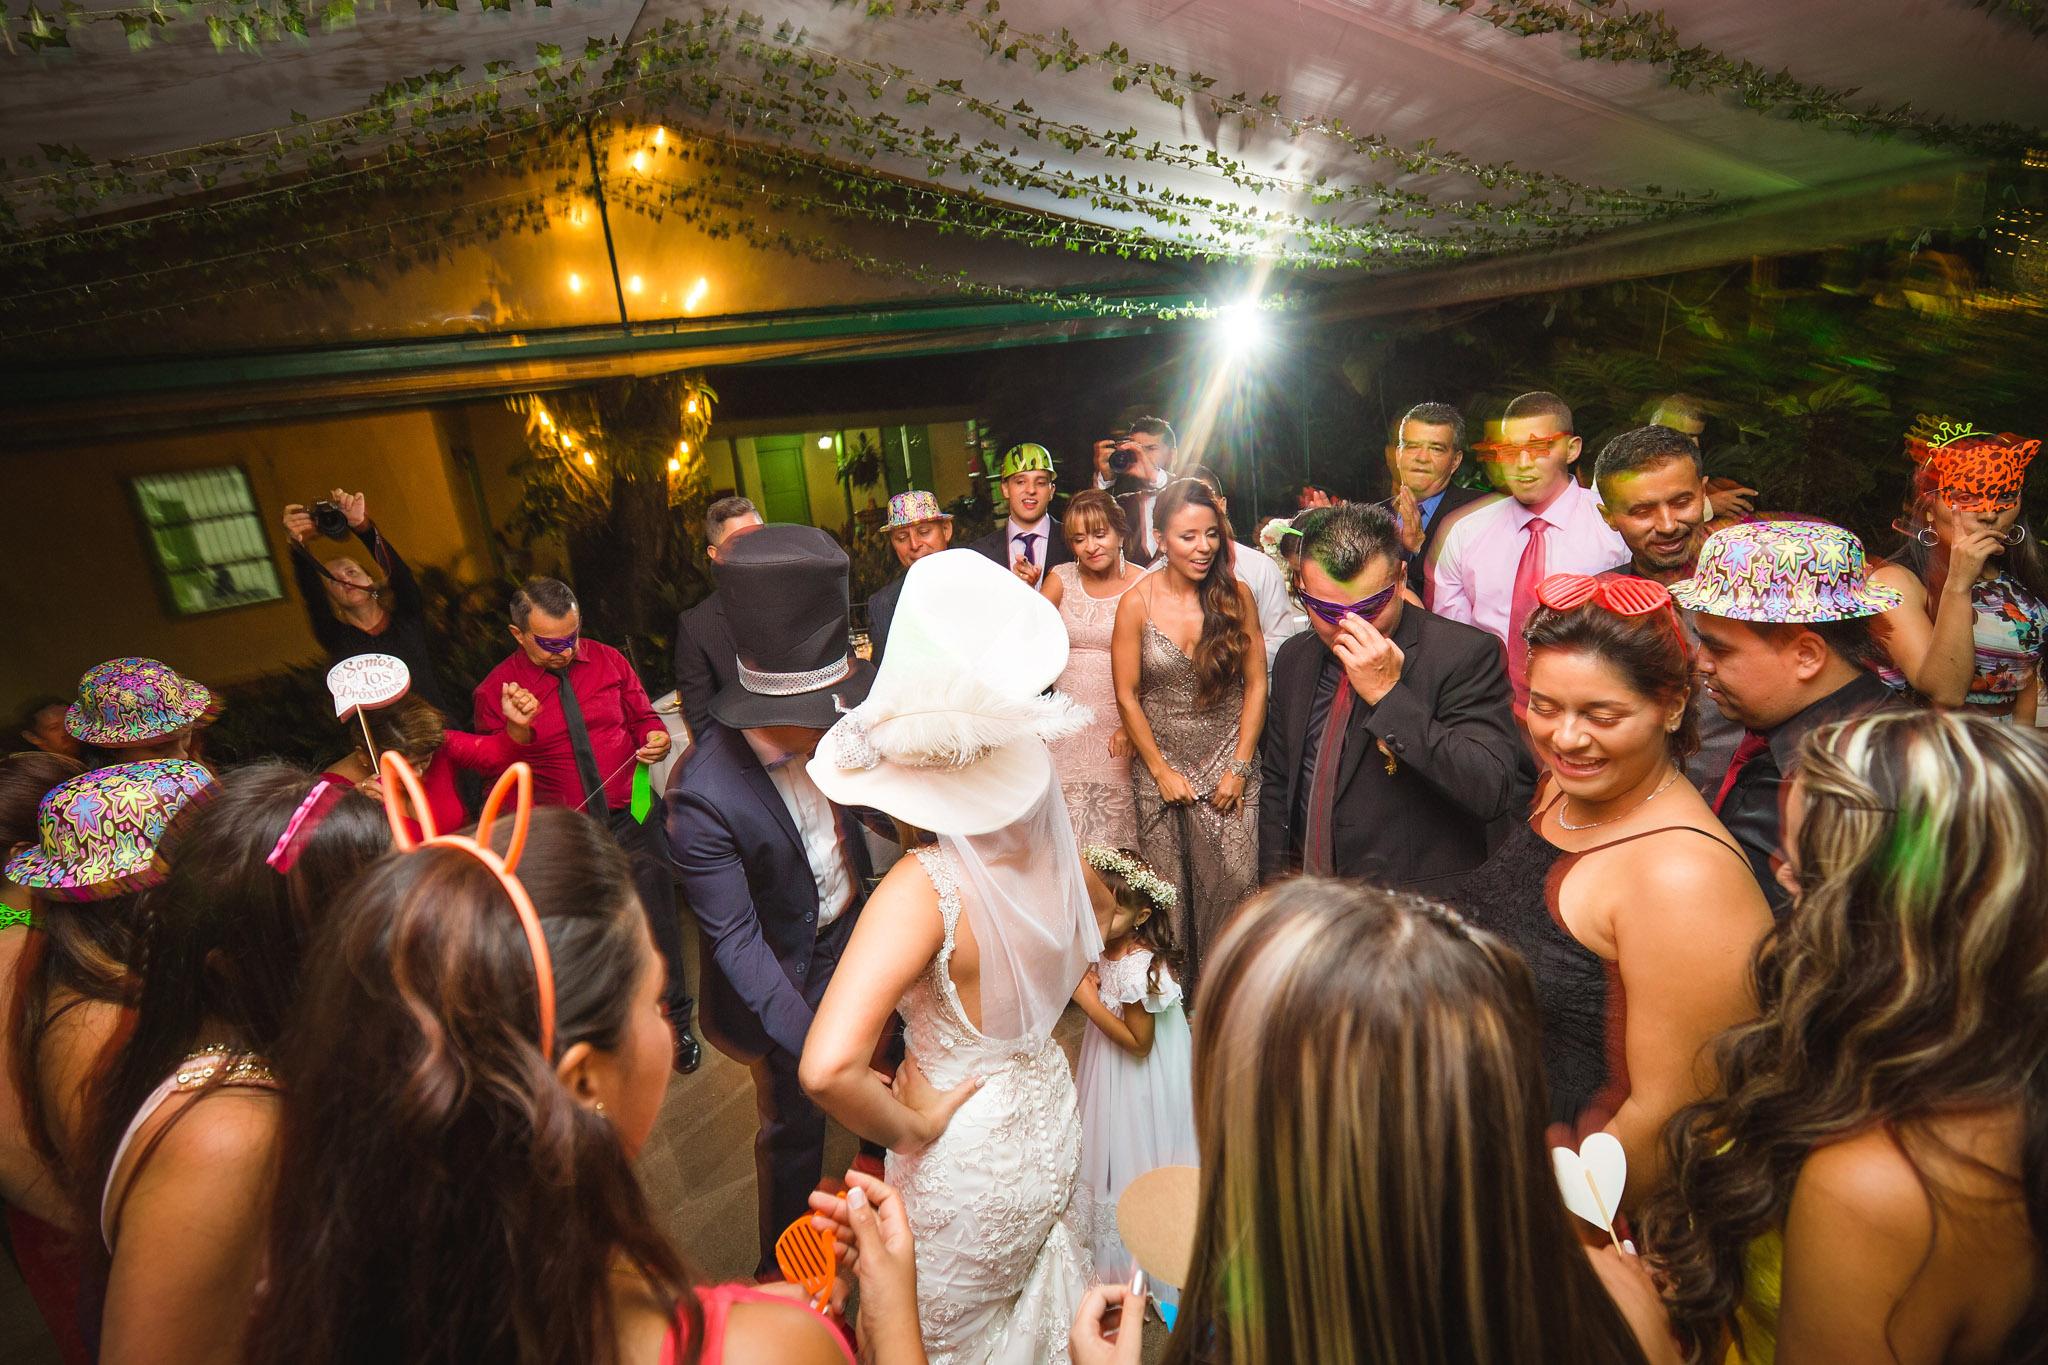 wedding-travellers-destination-wedding-photography-colombia-medellin-chuscalito-party-hora-loca